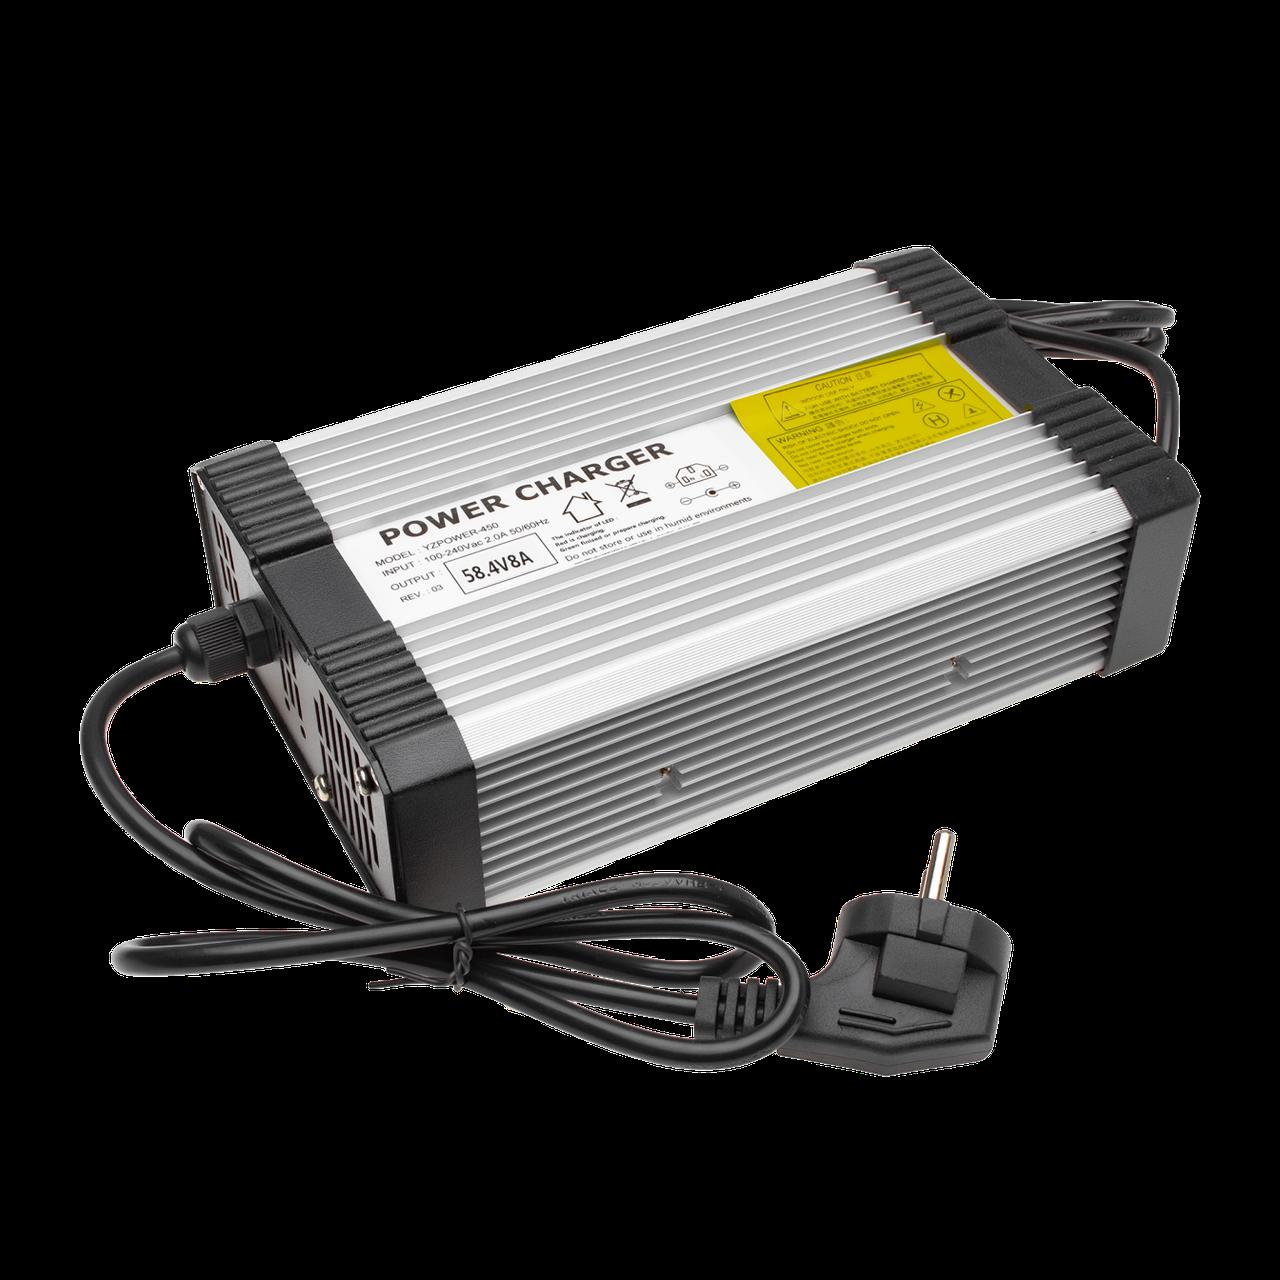 Зарядное устройство для аккумуляторов LiFePO4 48V (58.4V)-8A-384W